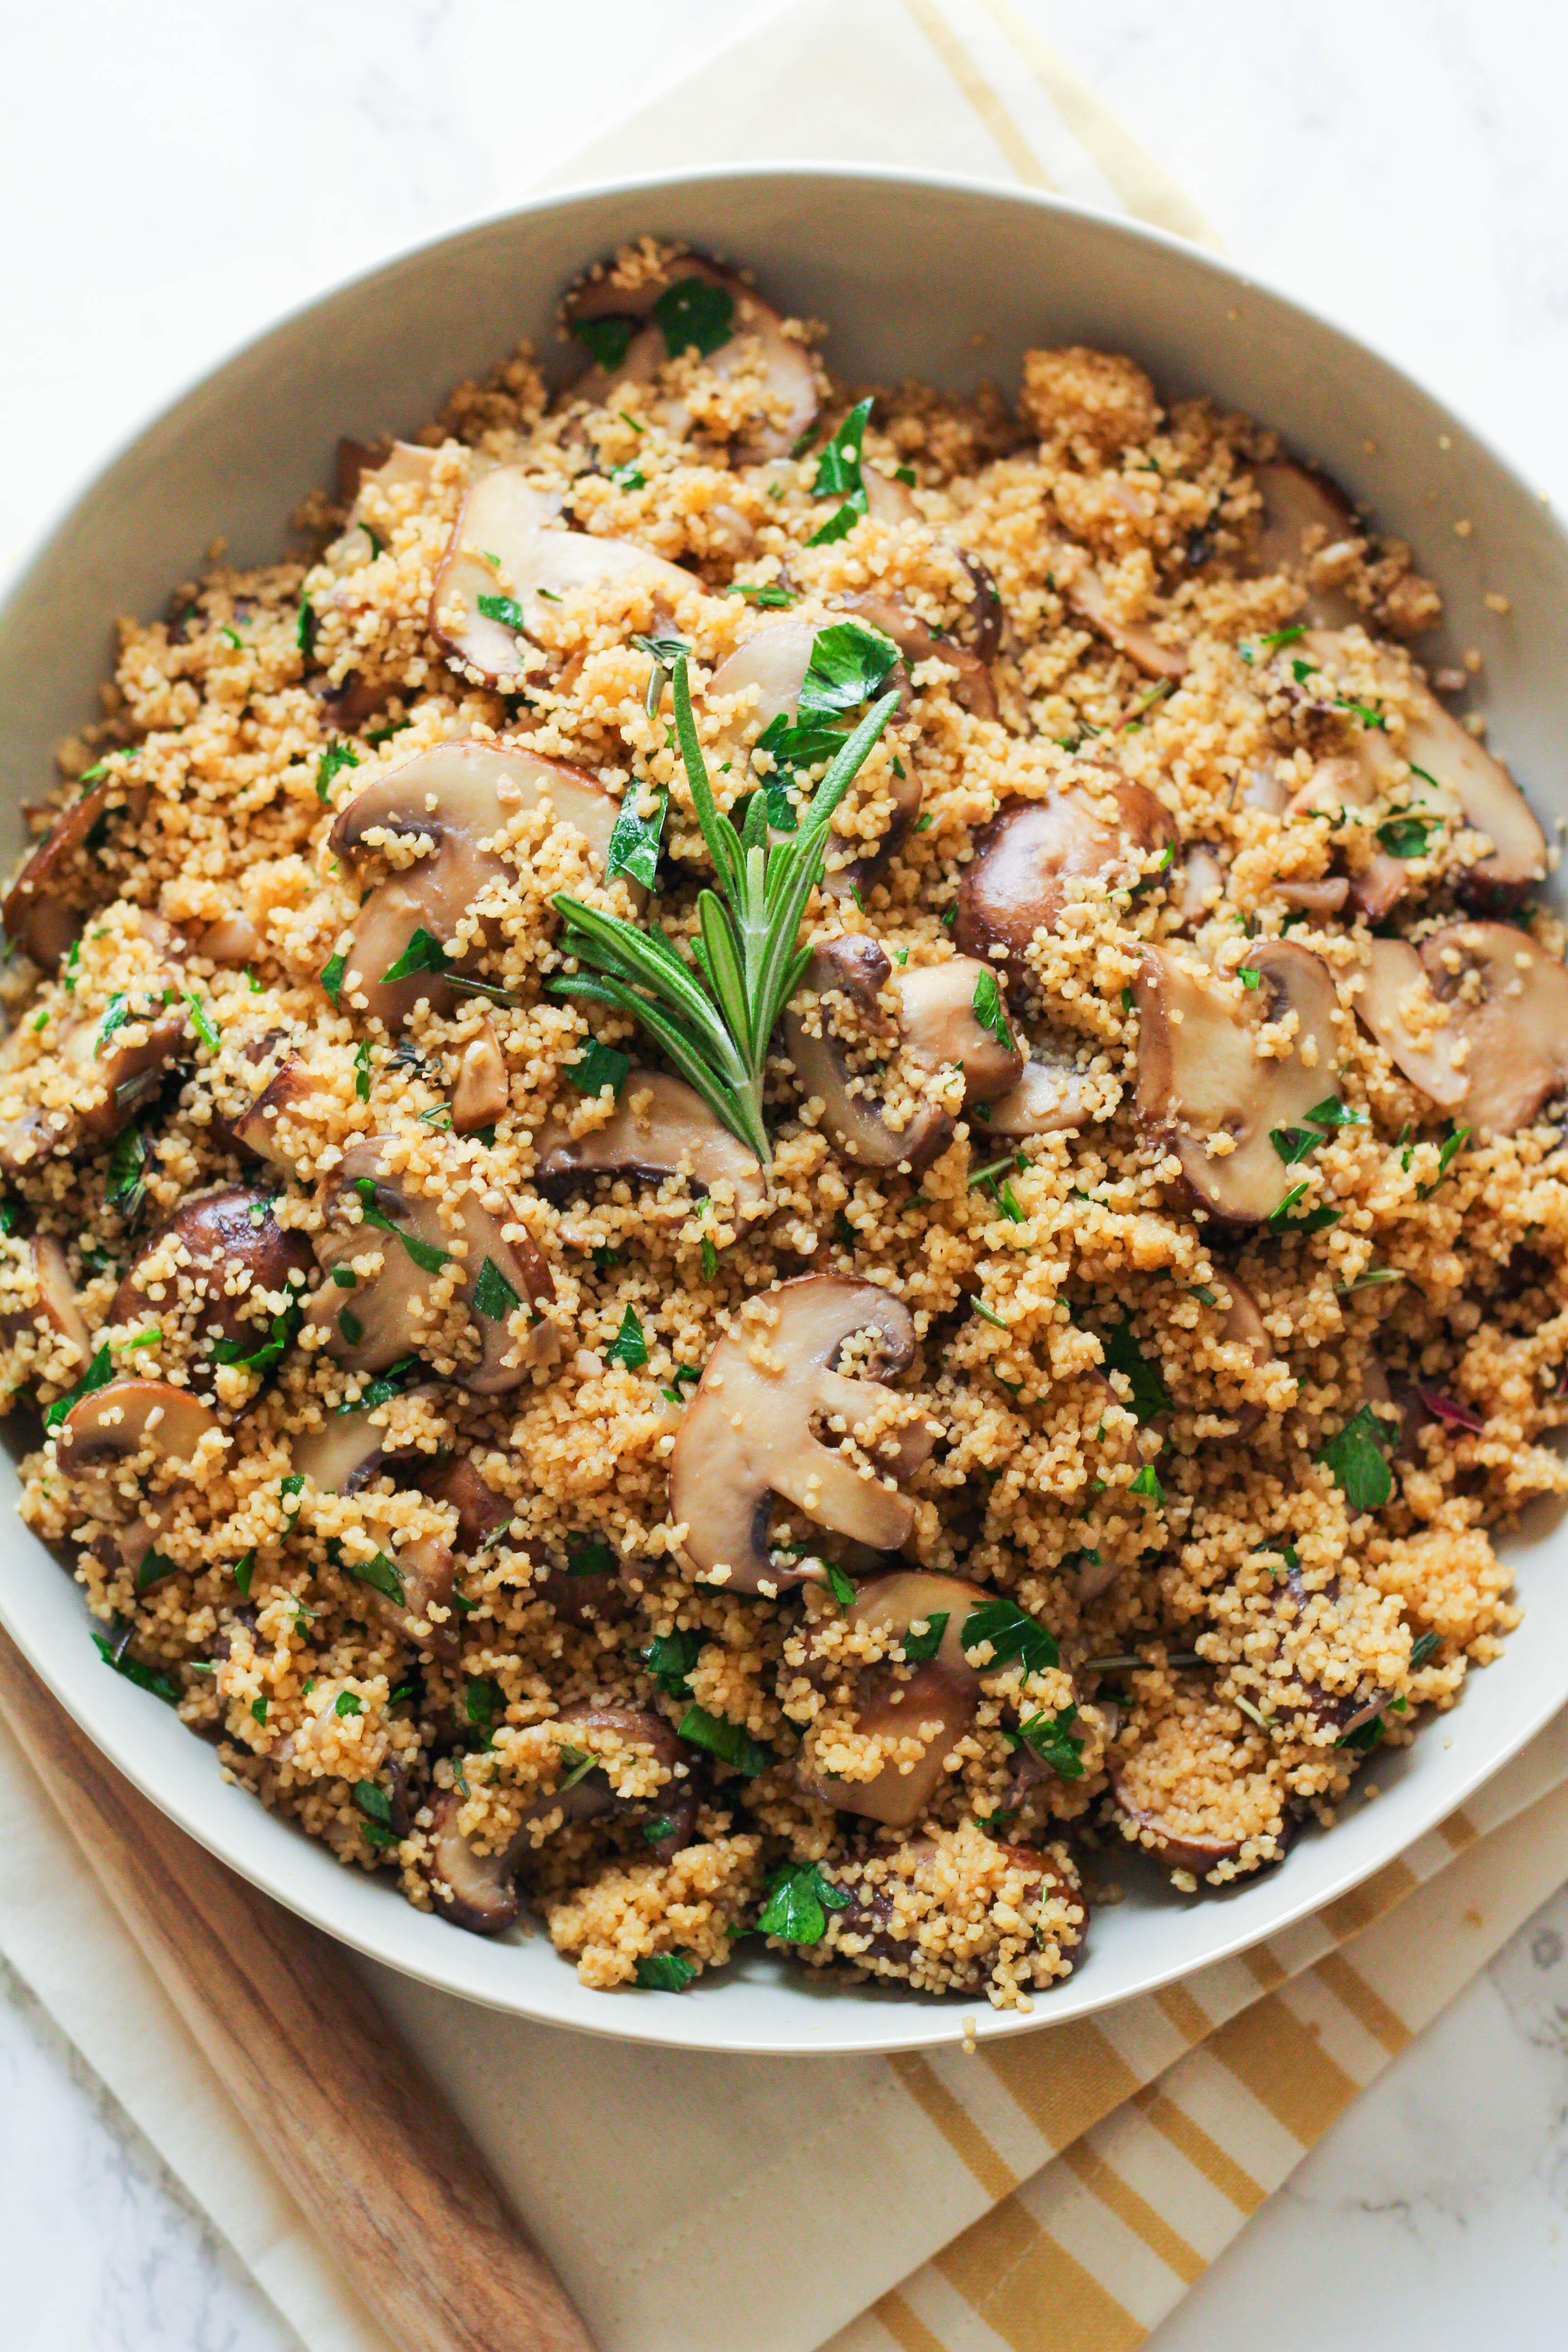 Cremini Mushroom & Herb Couscous Stuffing | Couscous | Mushrooms | Thanksgiving side dish